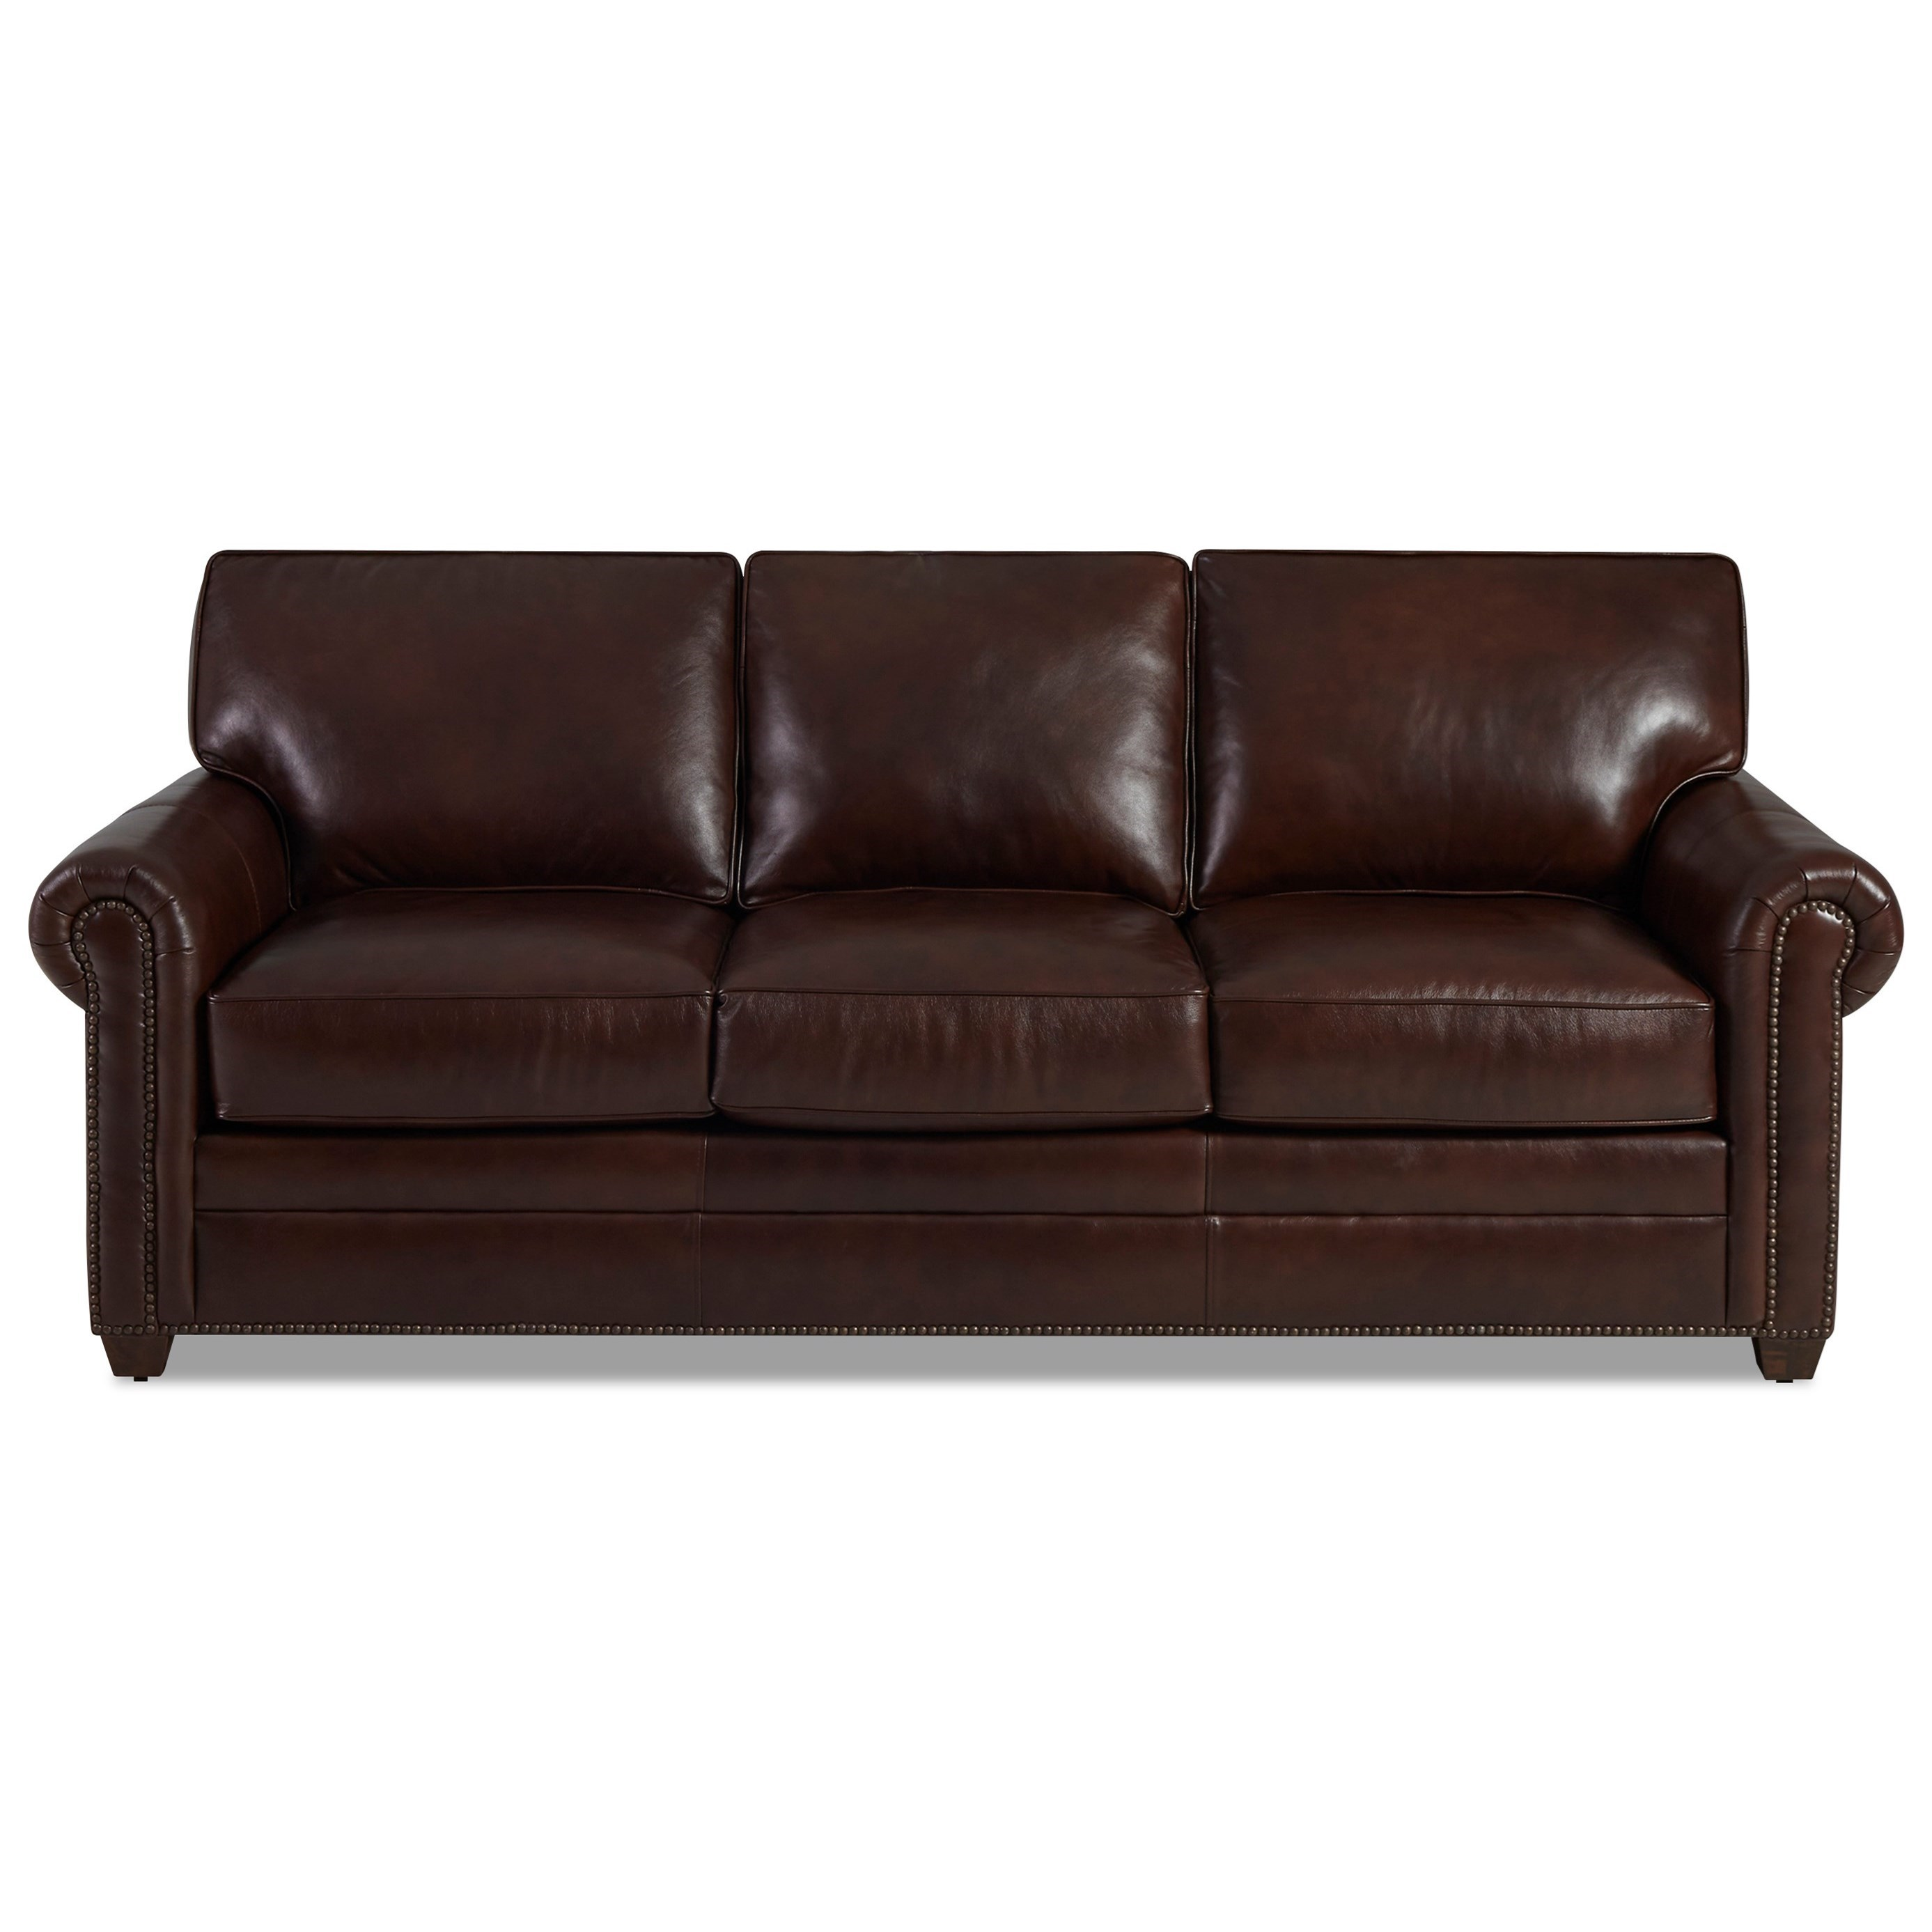 Joliet Sleeper Sofa by Klaussner at Johnny Janosik